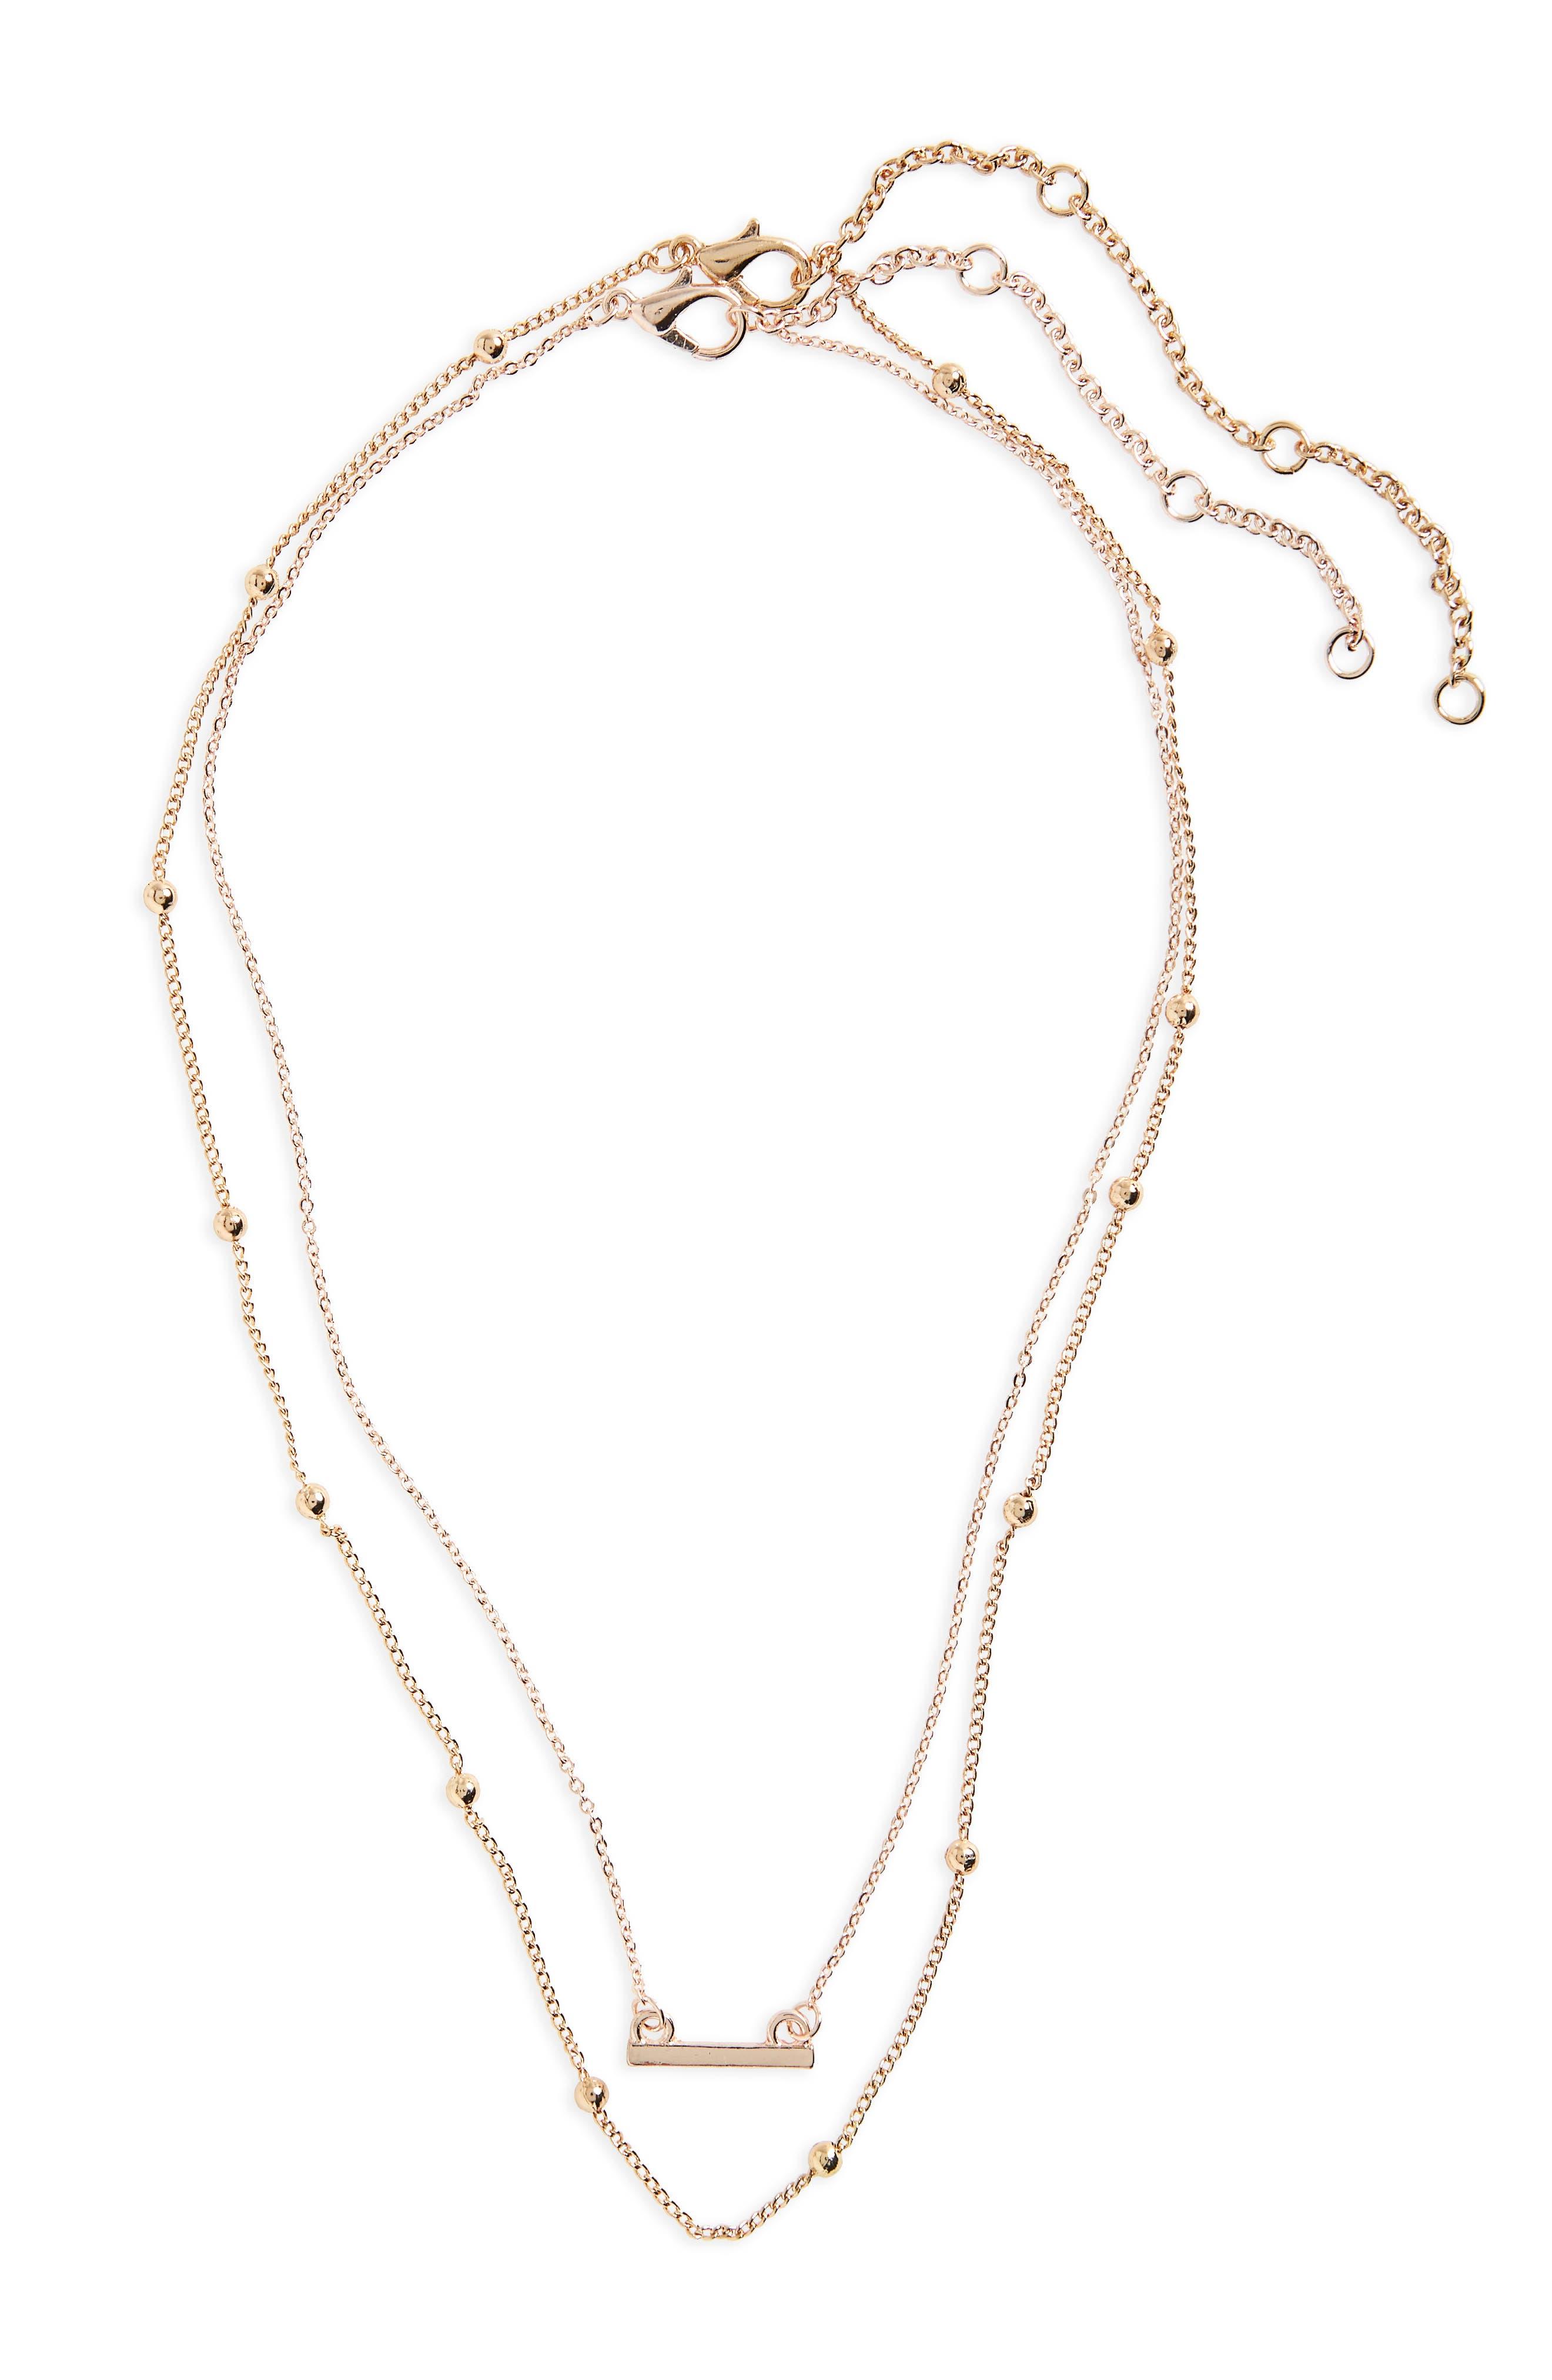 2-Pack Bar & Bead Necklaces,                             Main thumbnail 1, color,                             Gold